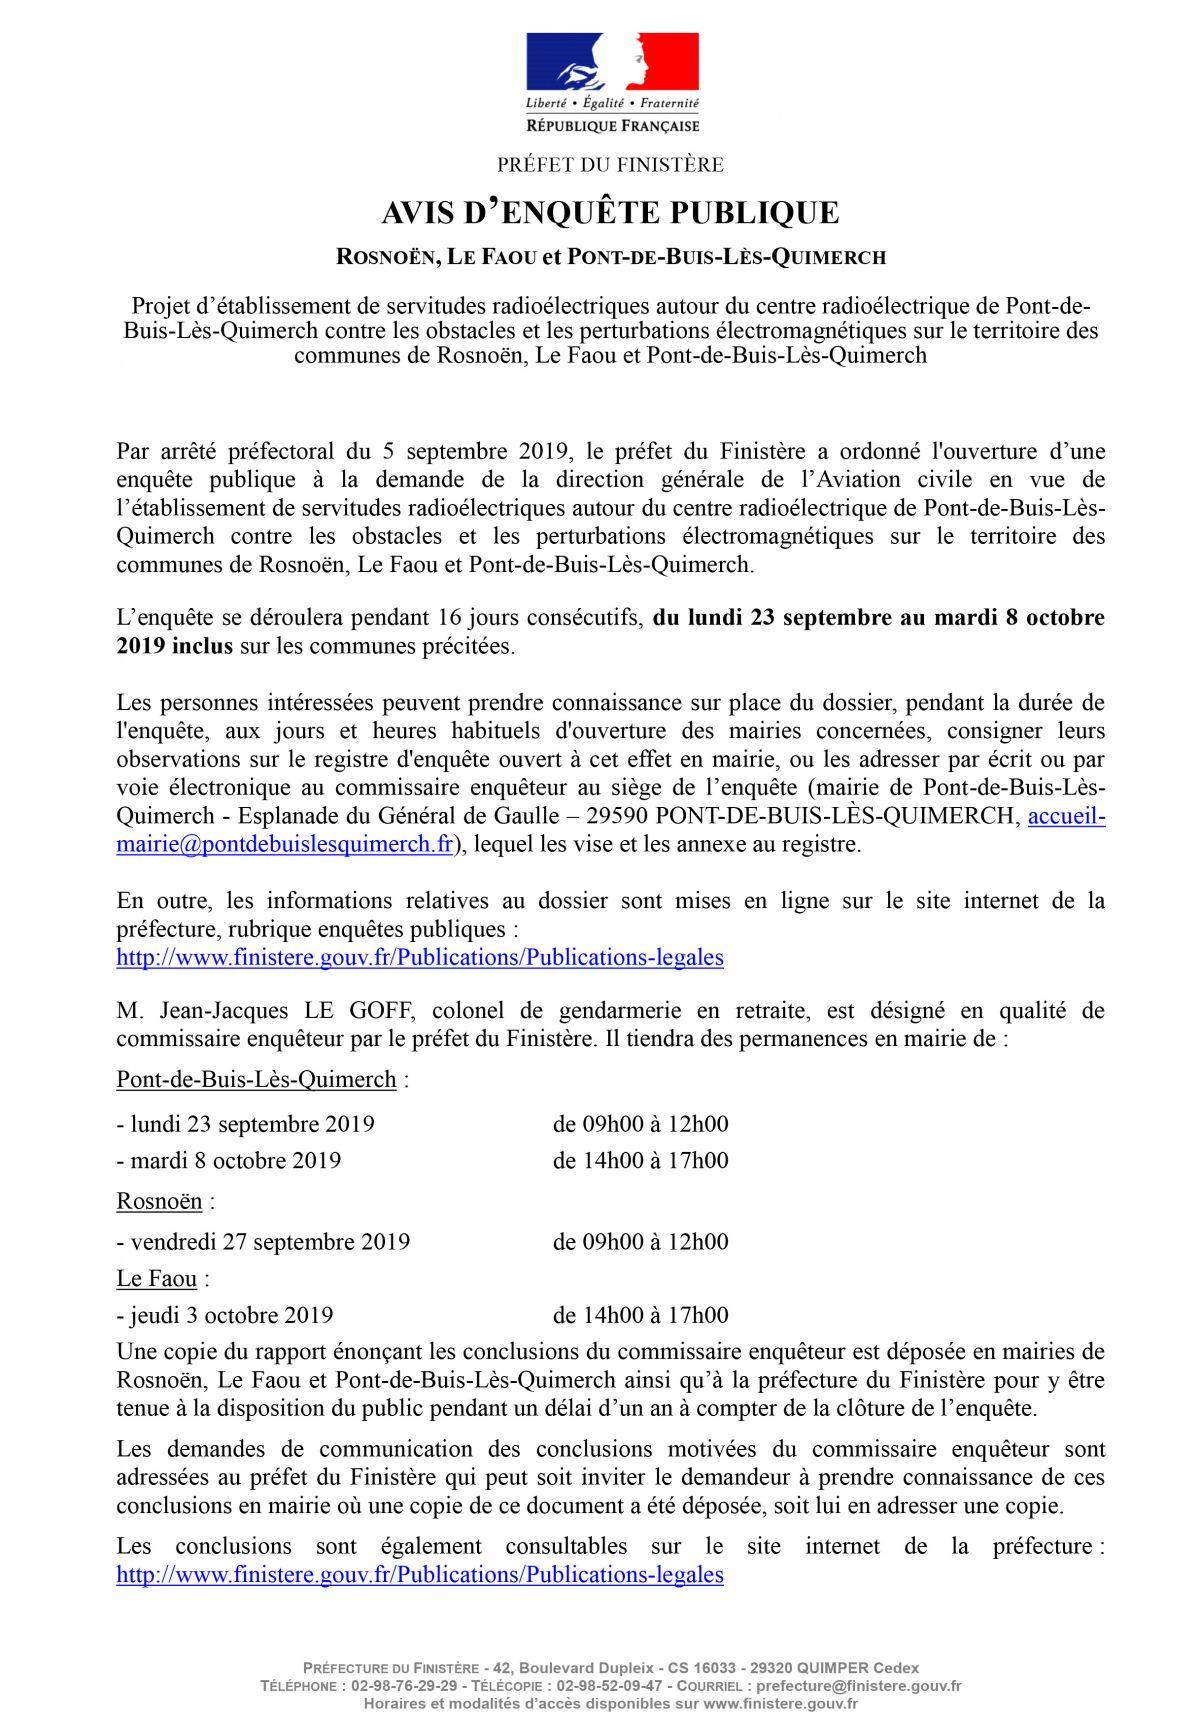 Courrier Electronique SIRP. PREFECTURE DU FINISTERE